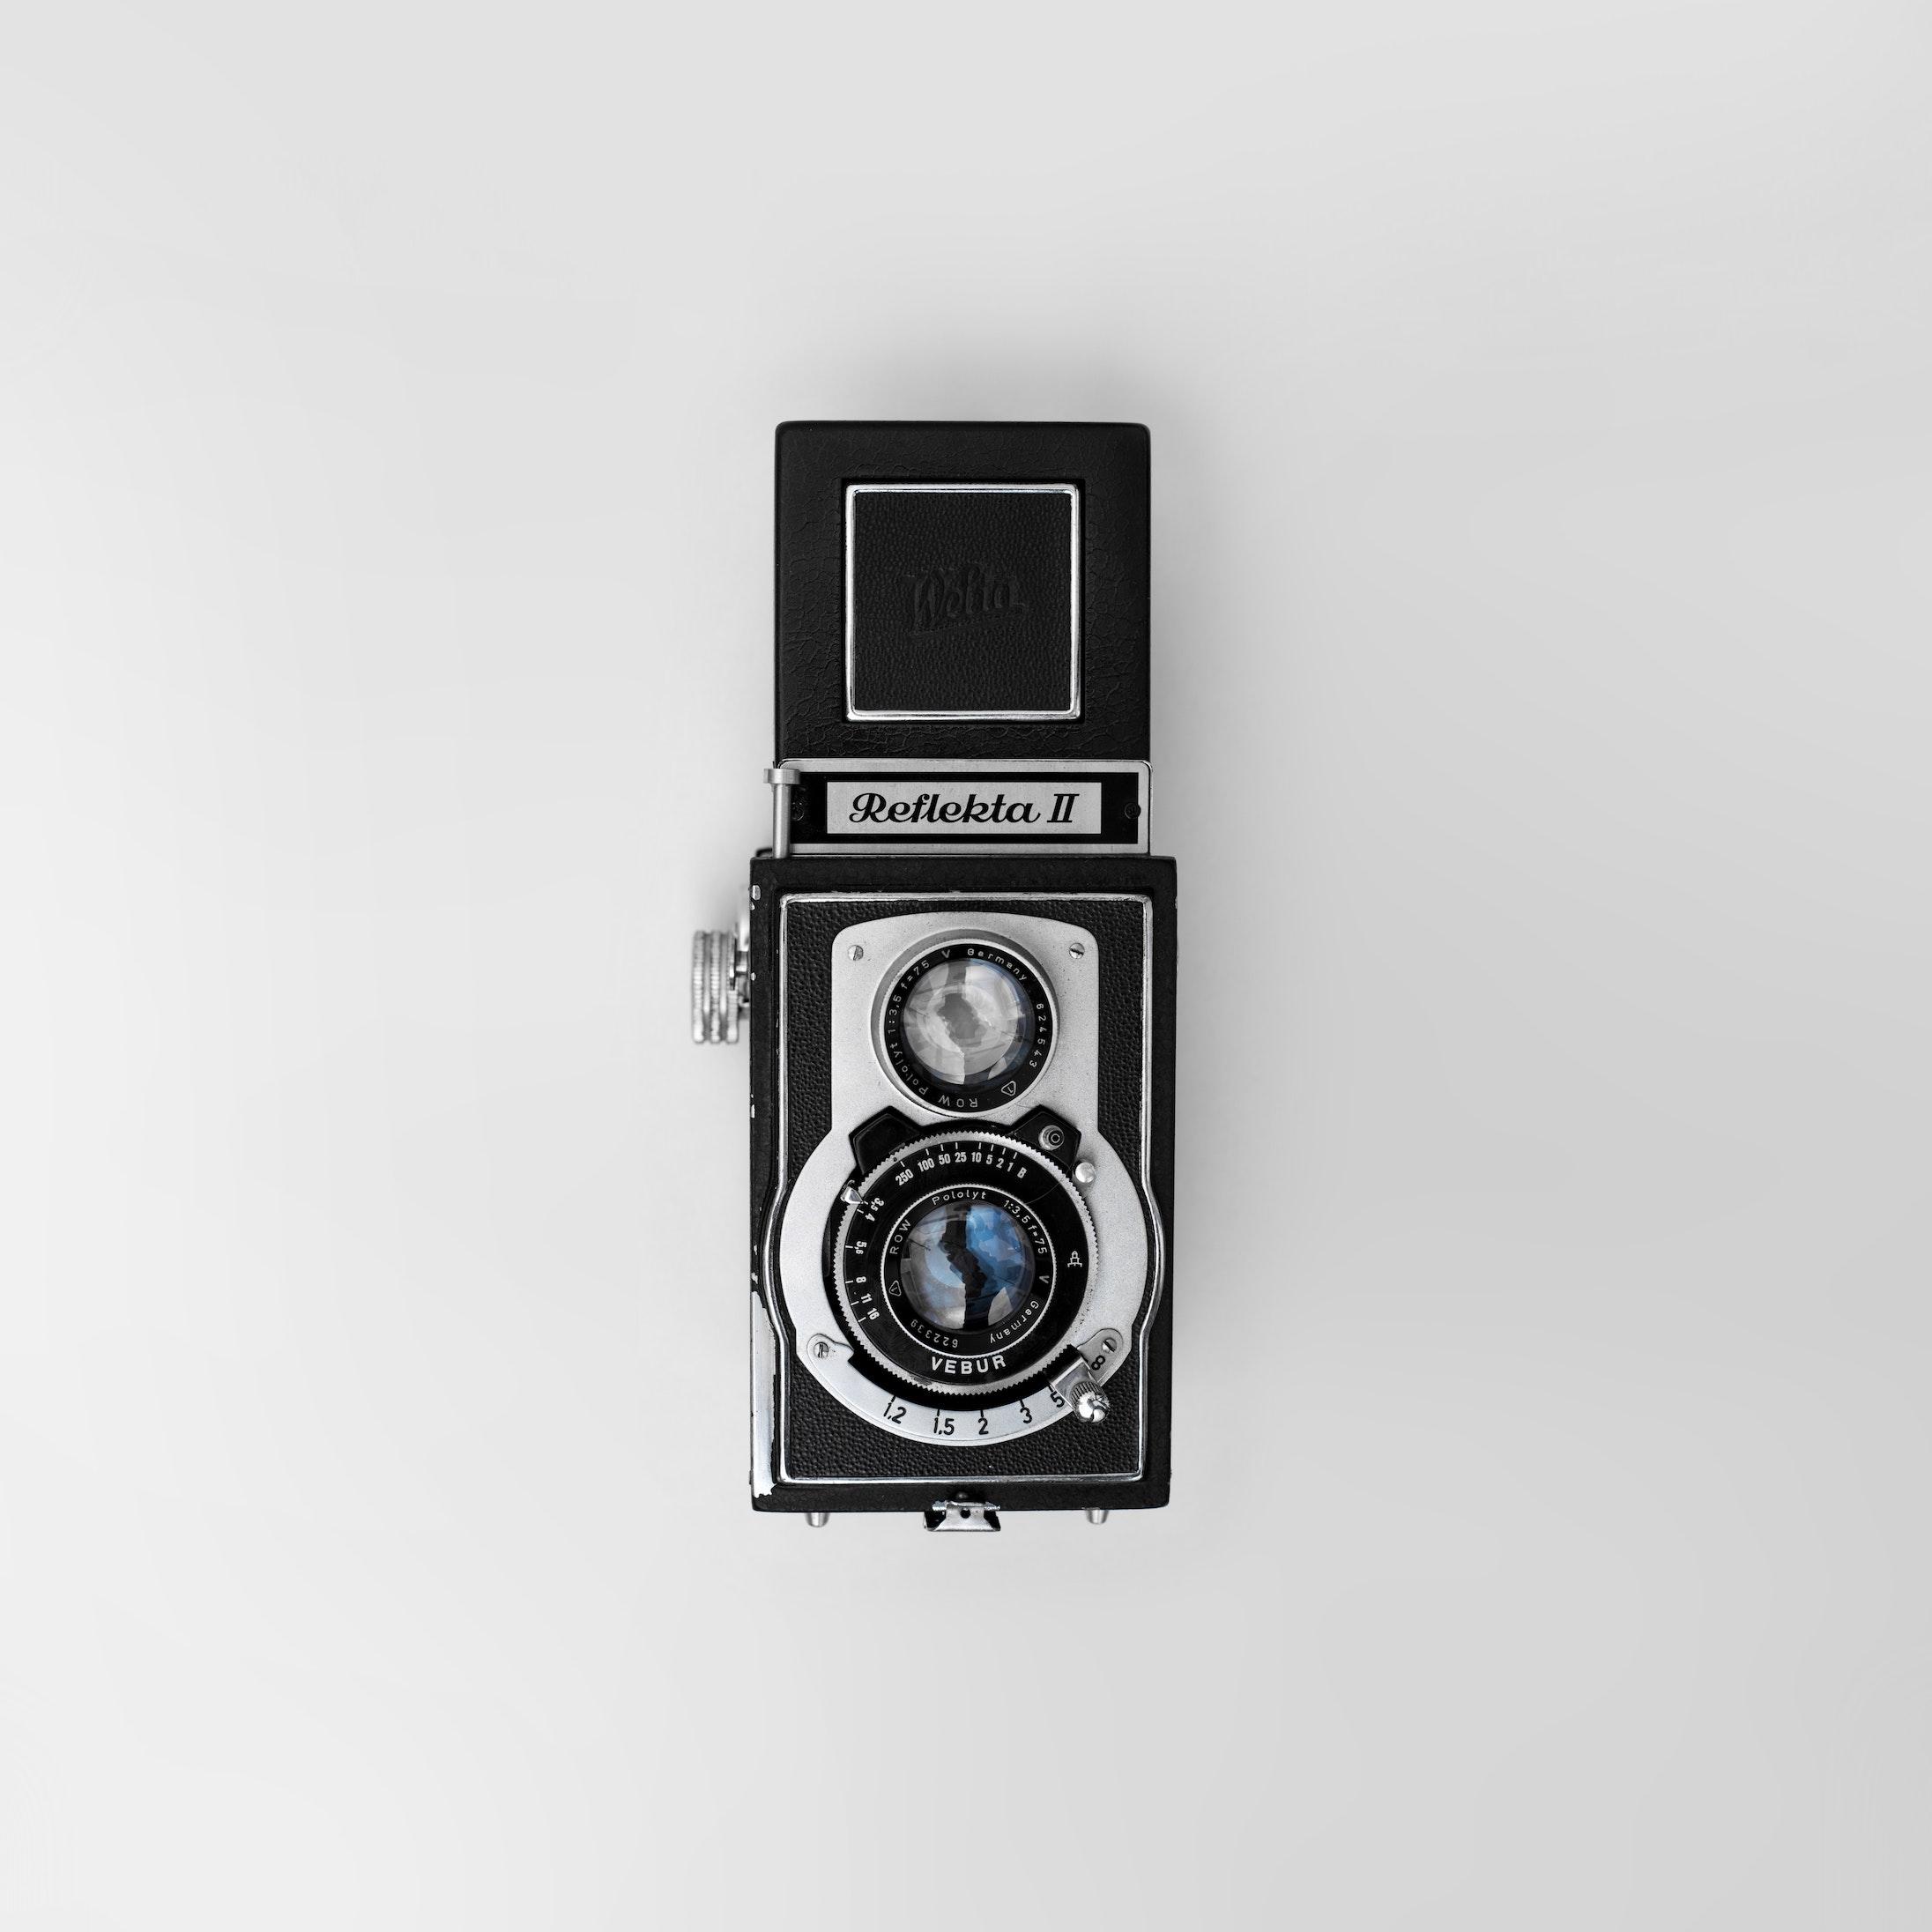 analog-antique-camera-821653.jpg copie.jpg